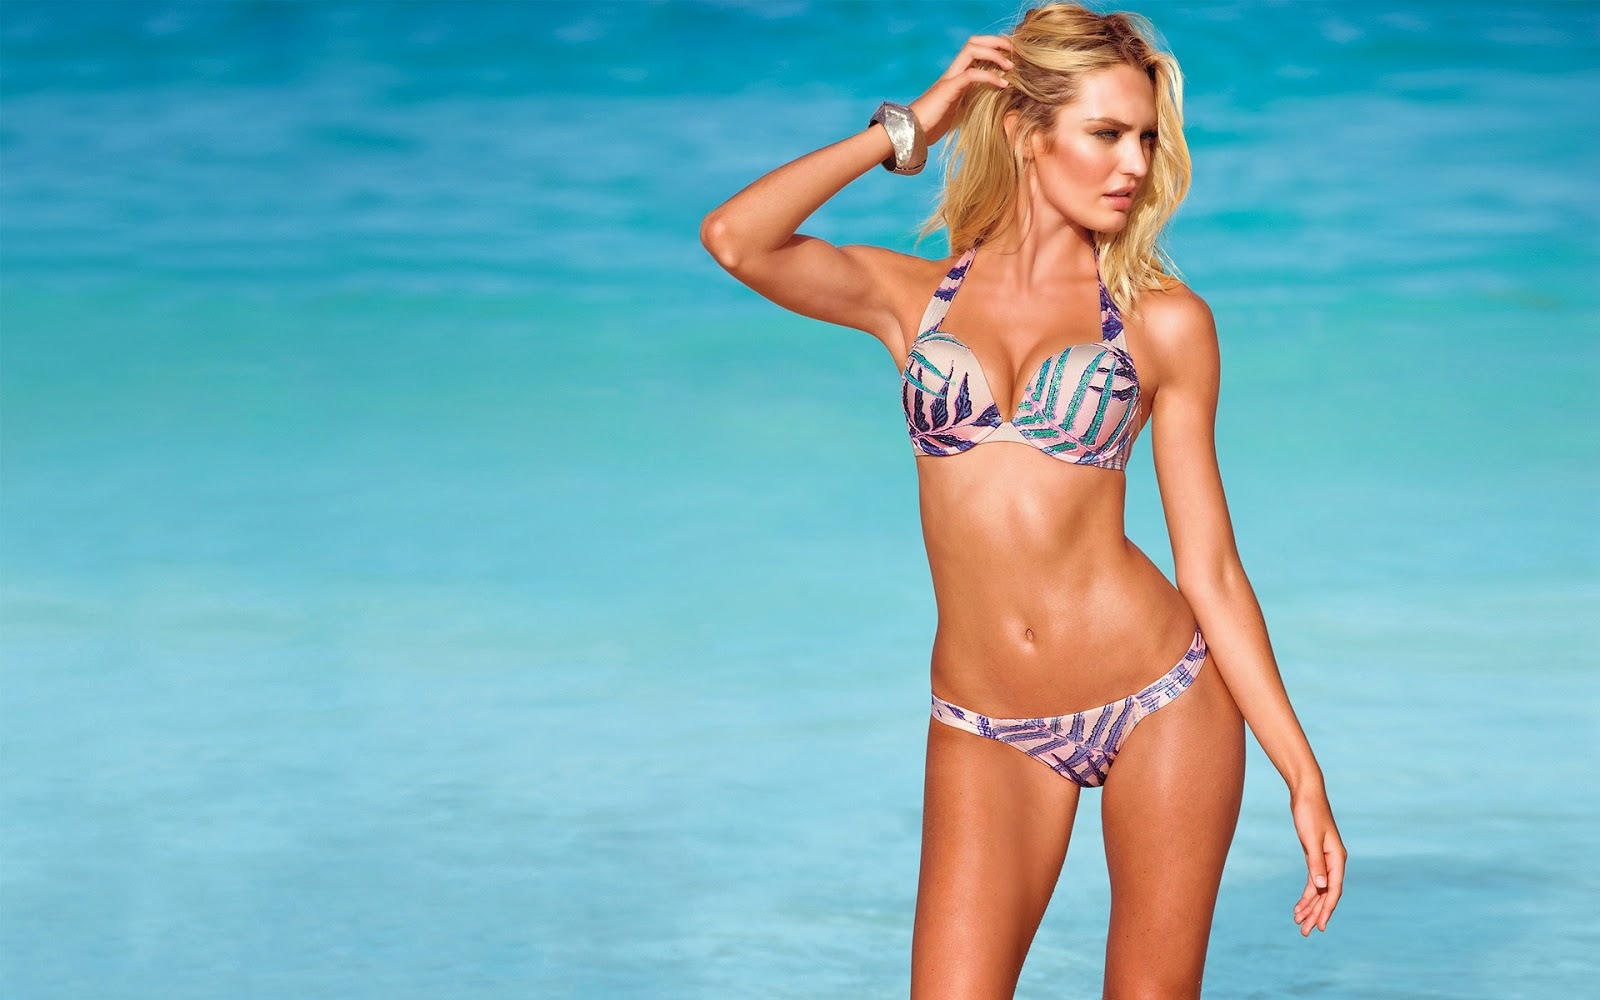 Global pictures gallery candice swanepoel fashion model - Hd bikini wallpaper download ...